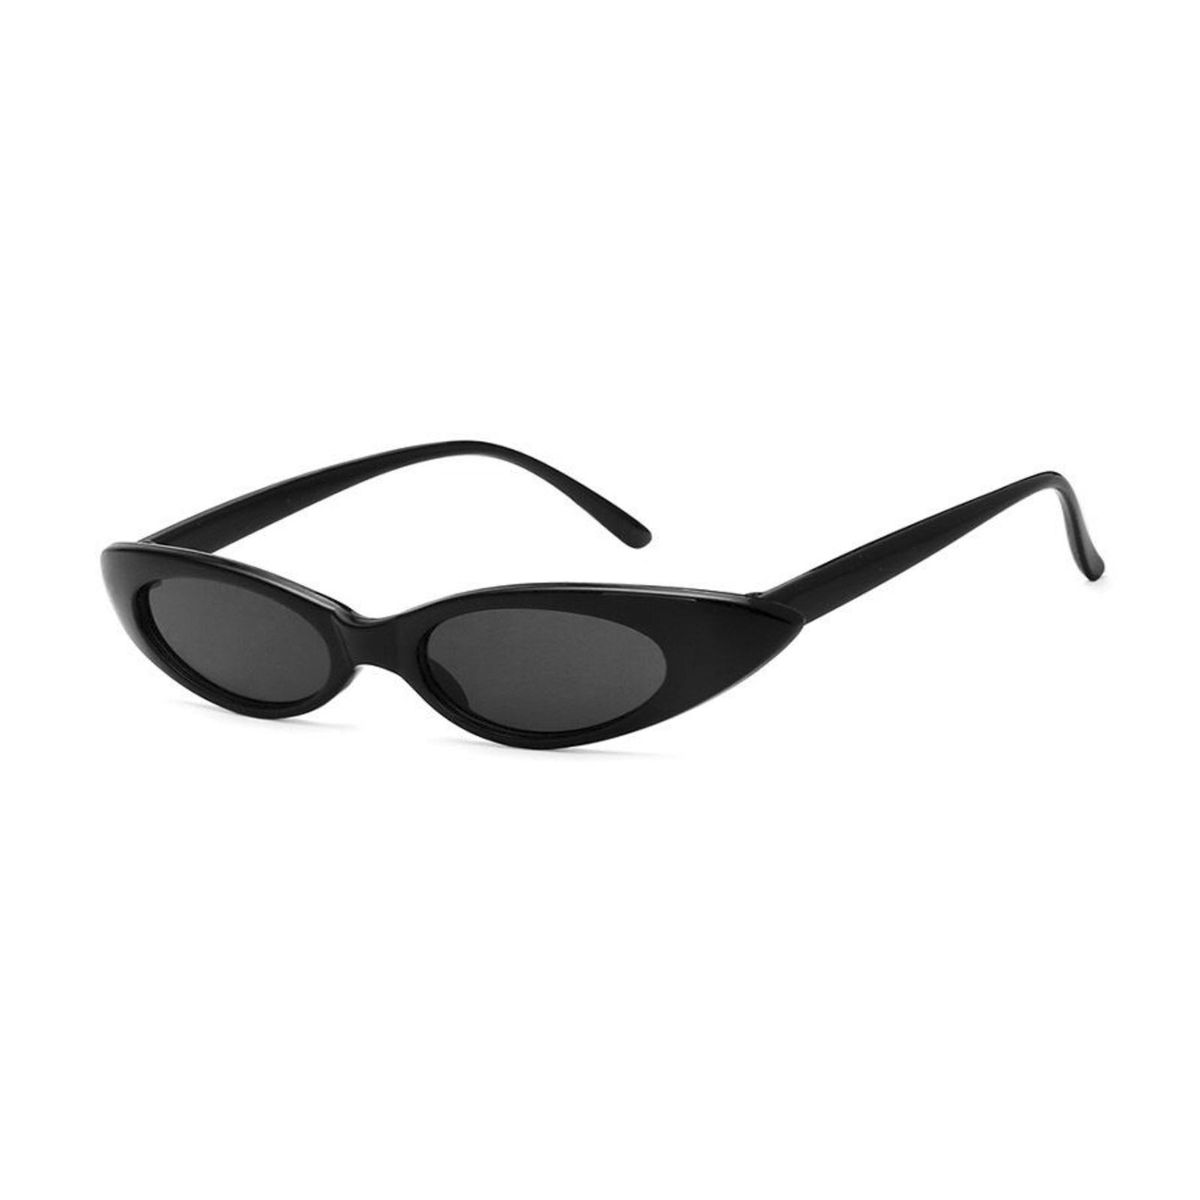 f891d5c0f758f óculos de sol kitty   mini vintage skinny slim gatinho oval anos 90 unissex  - óculos